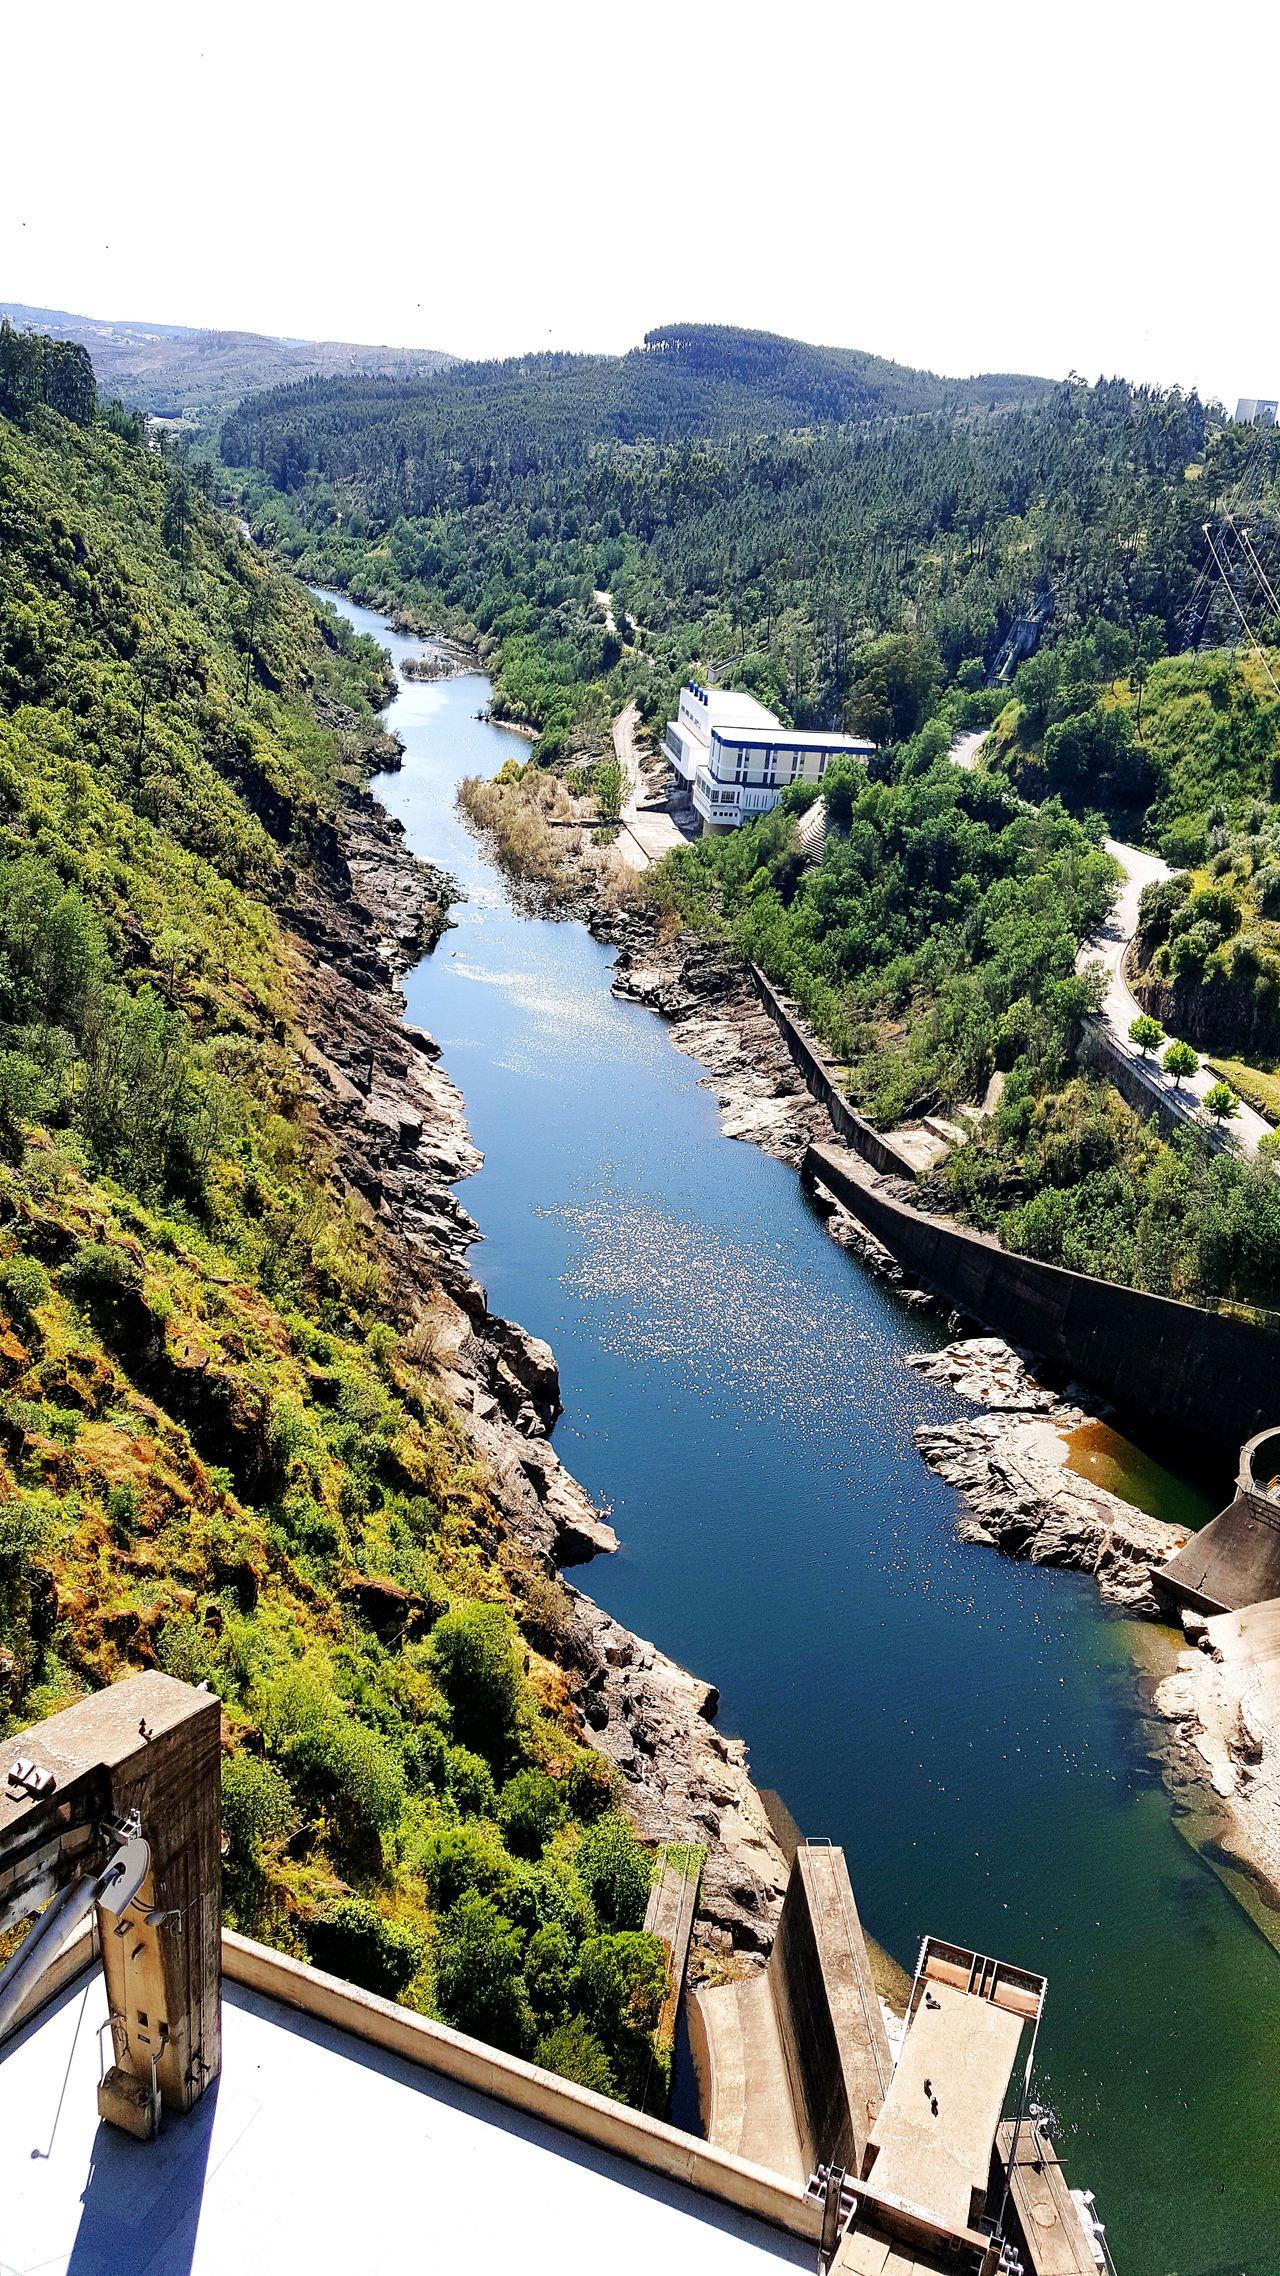 Barragem Rio Water Barragensdeportugal Barragemcastelodobode Natureza🍁 Natureza 🐦🌳 River